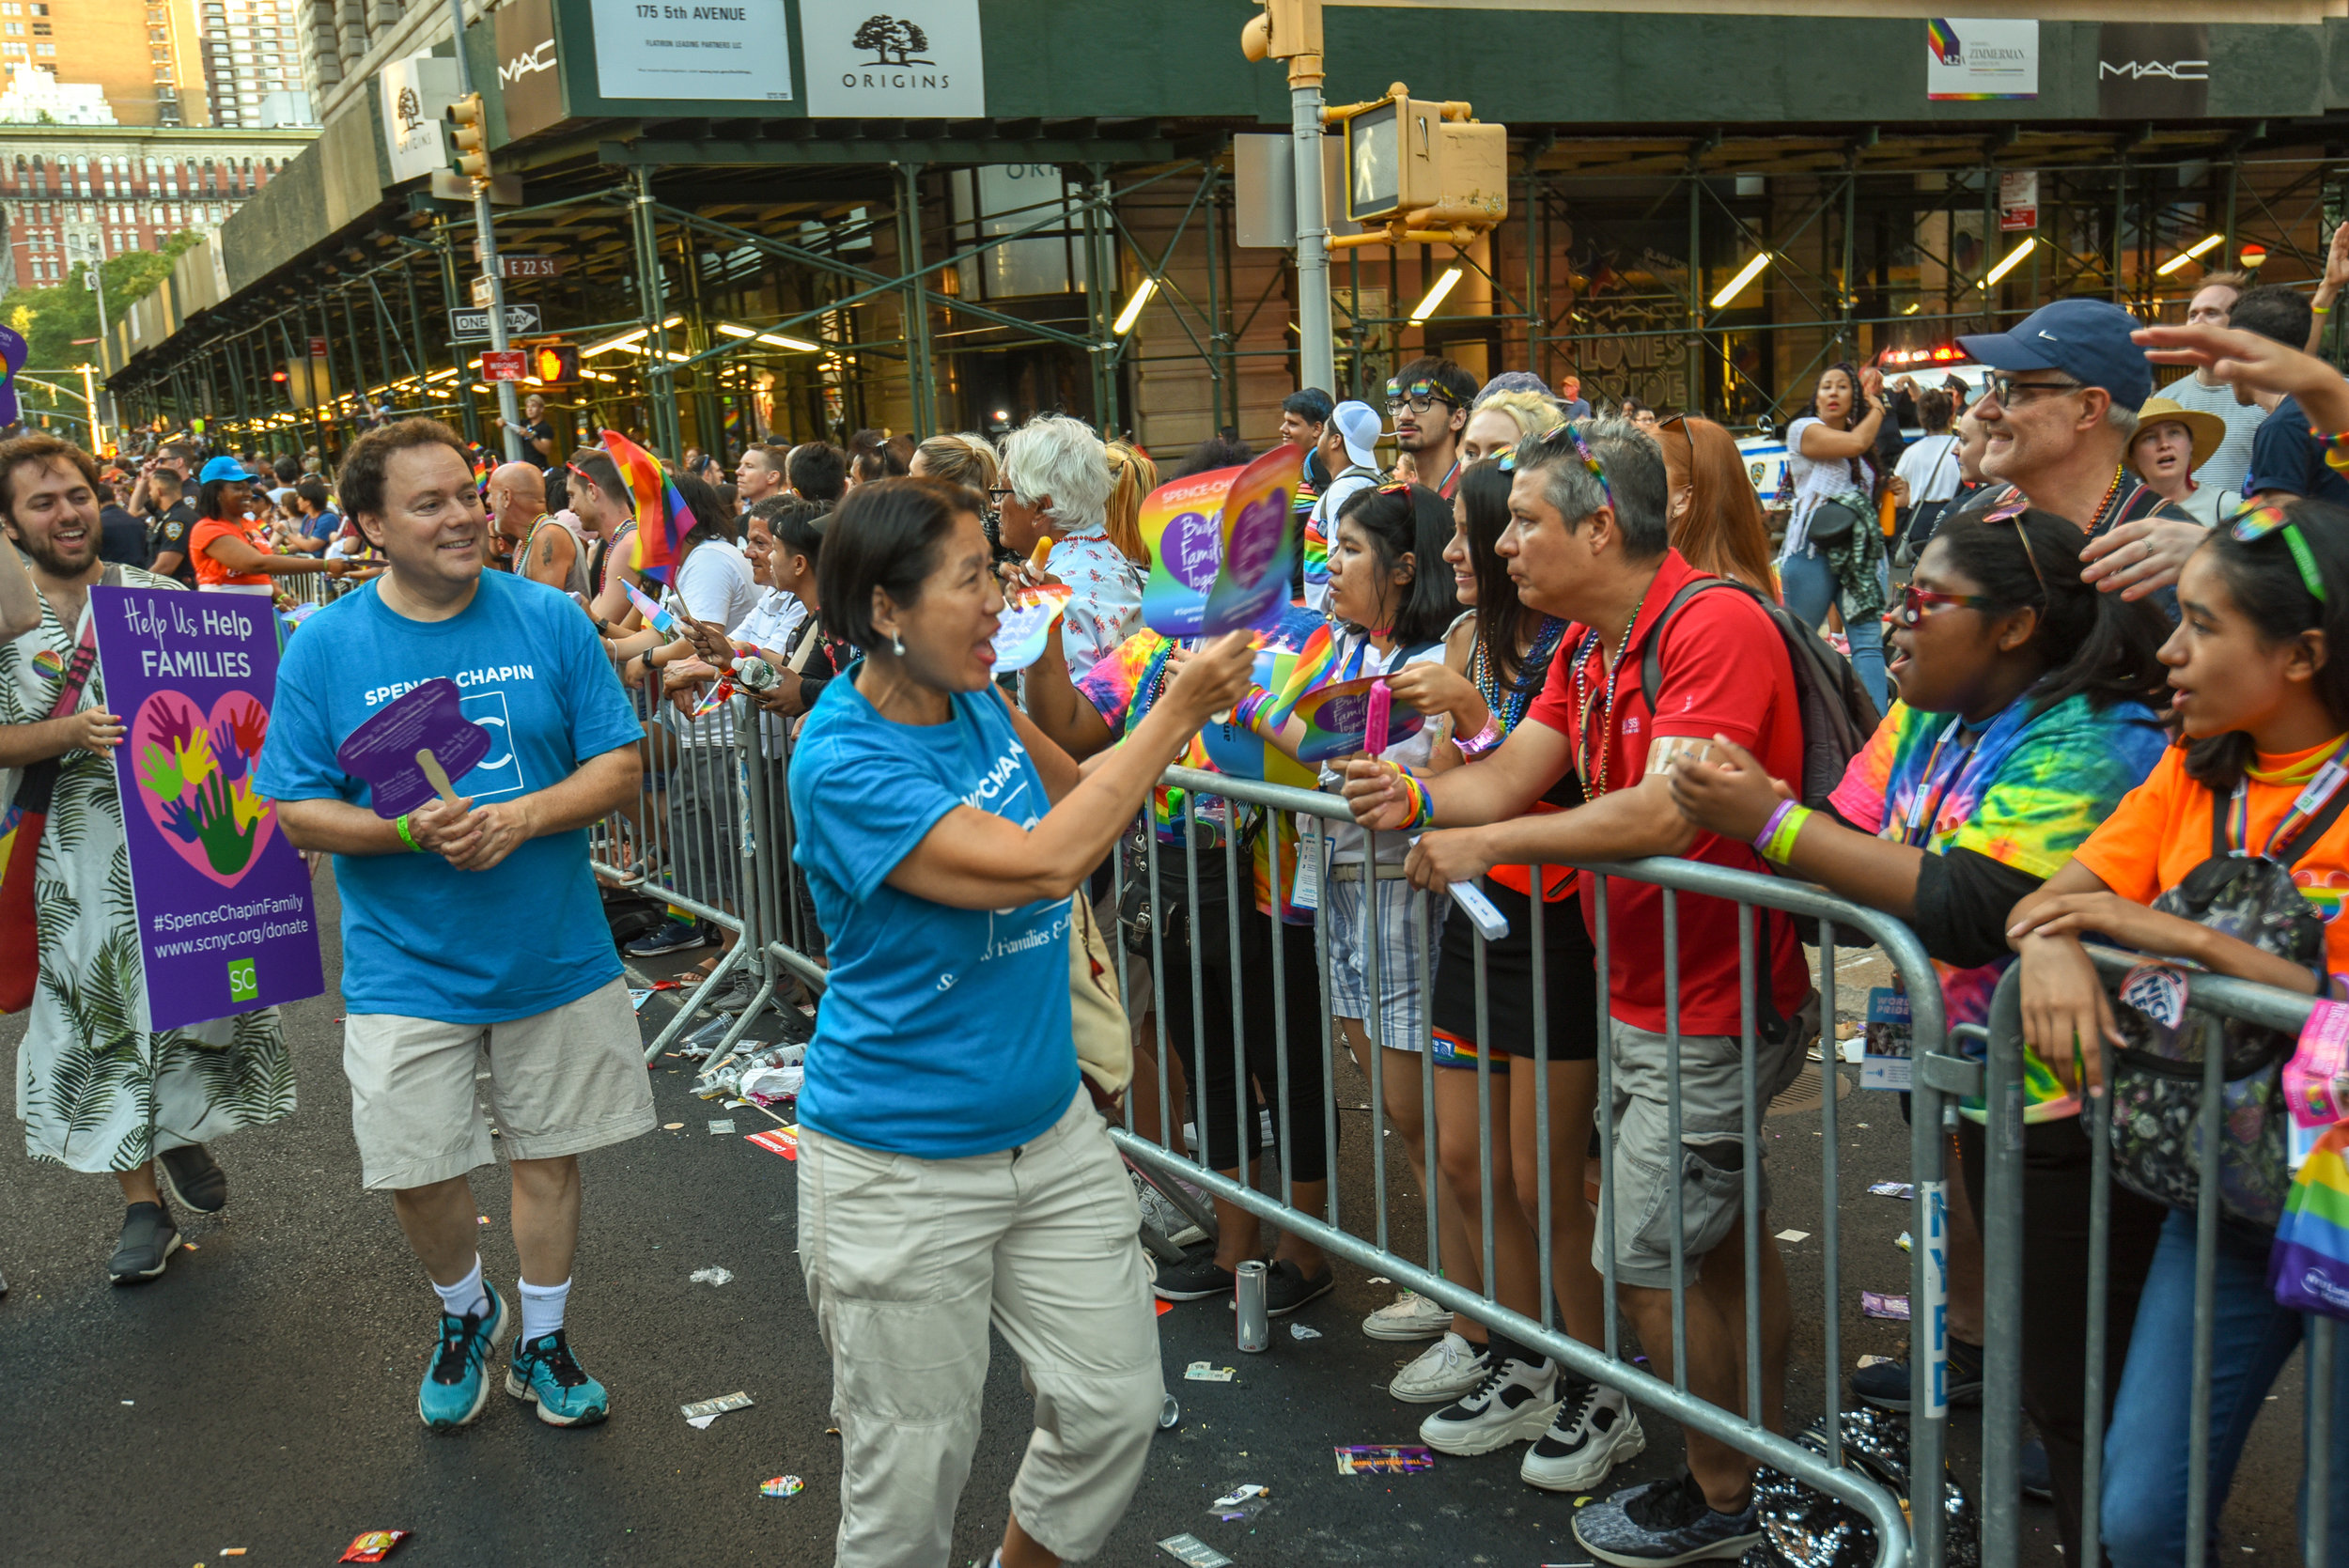 SC-PrideParade-2019_FE-315.jpg